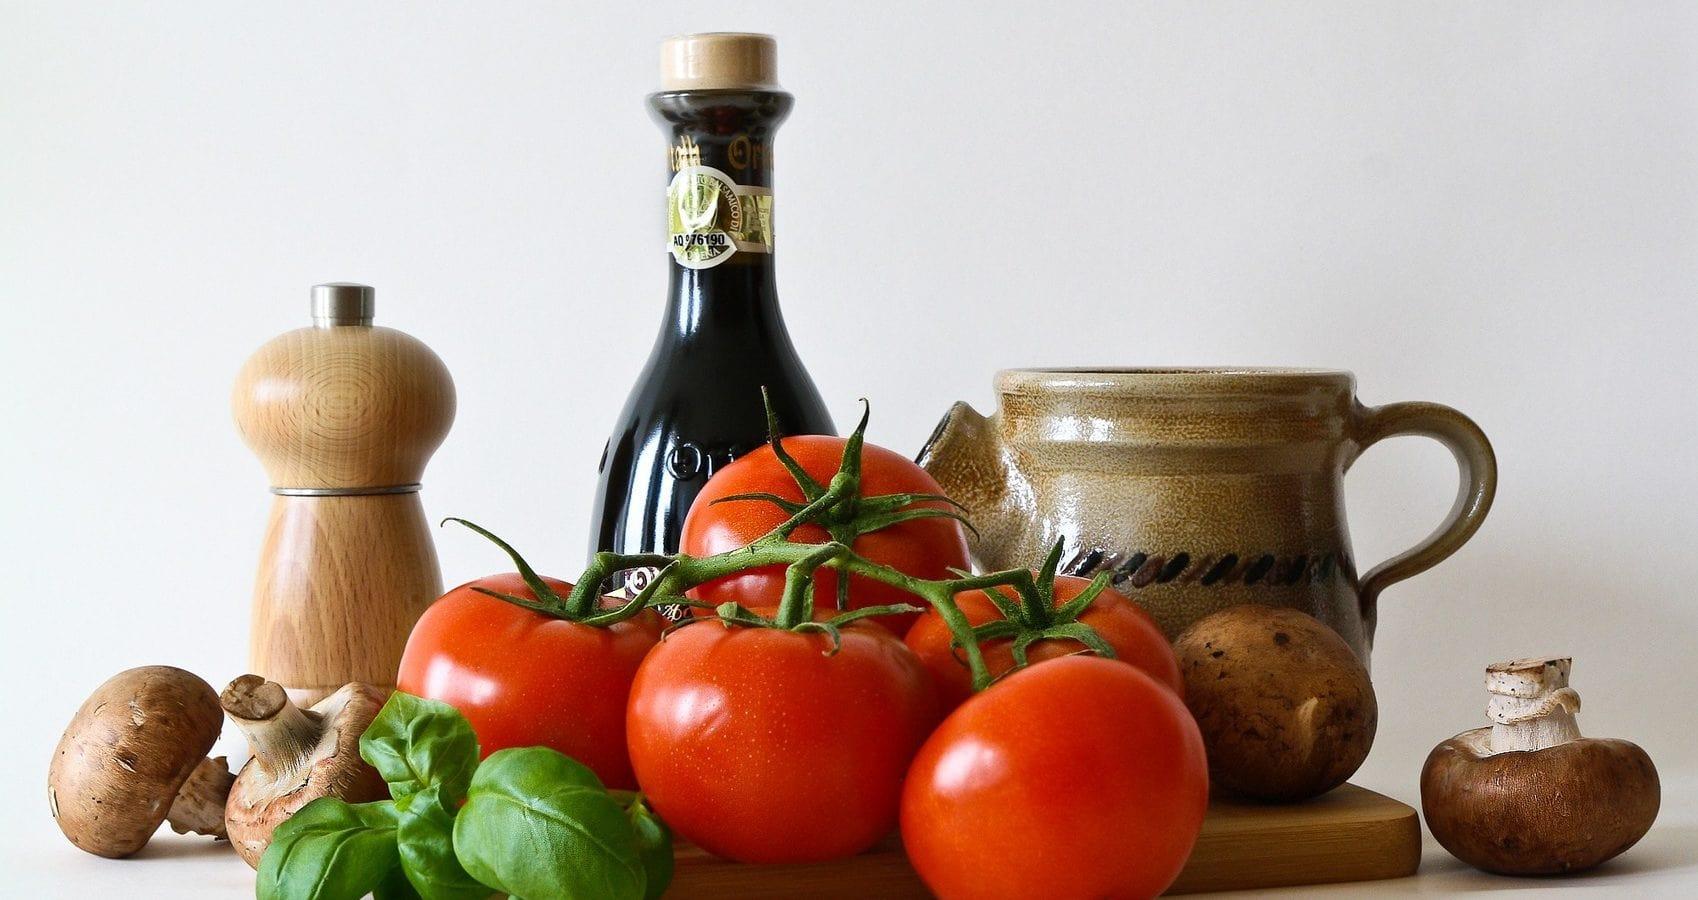 Foto: Gemüse. Pxhere/CC